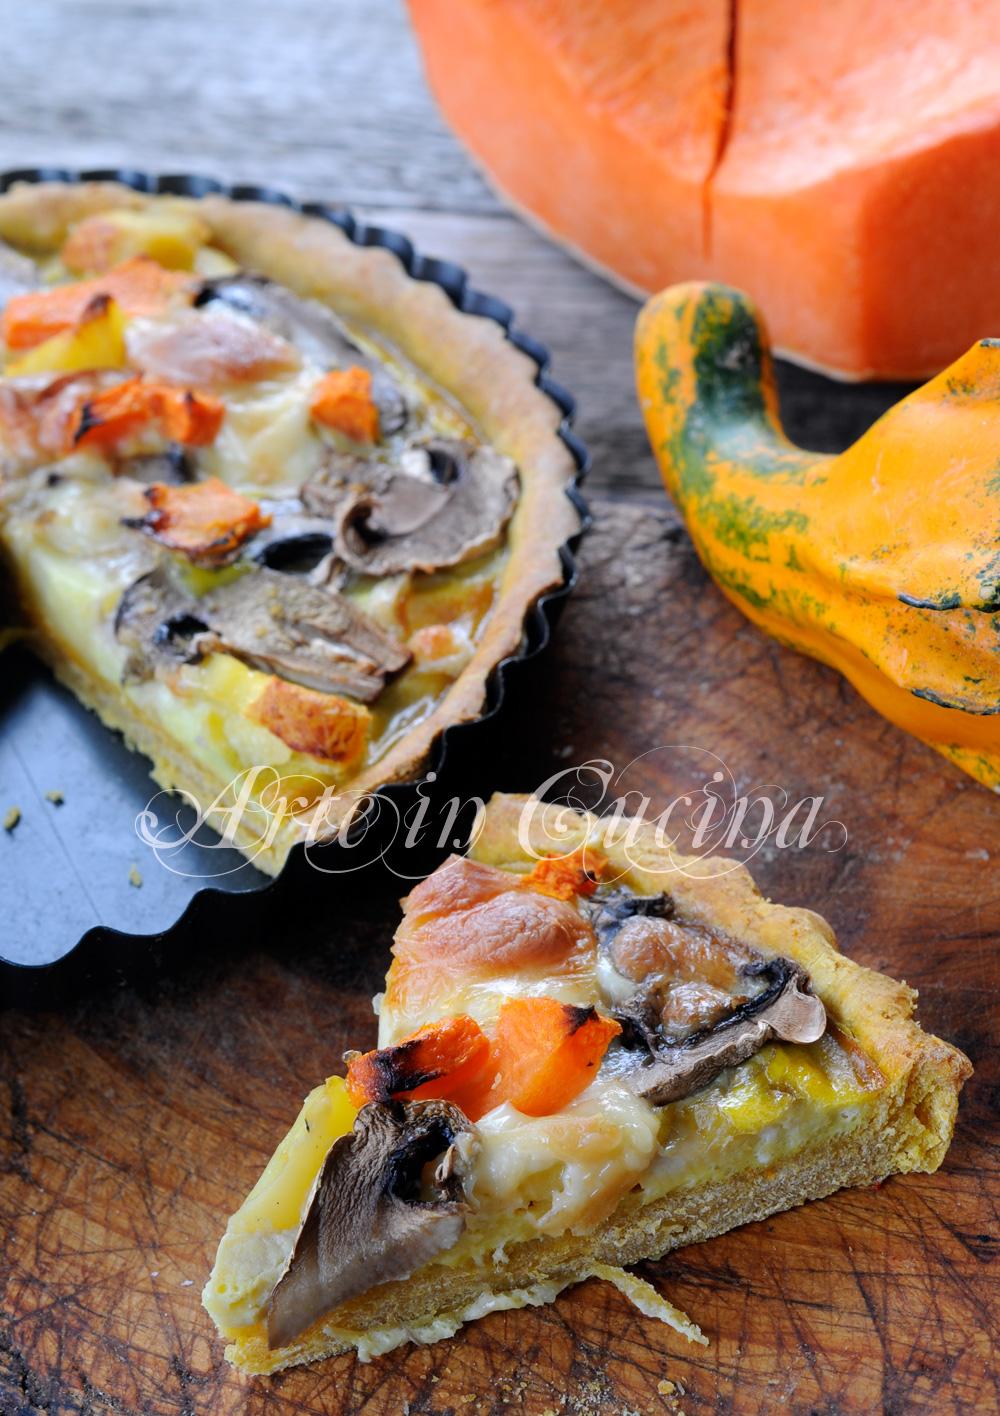 Crostata di zucca patate e funghi ricetta piatto unico vickyart arte in cucina